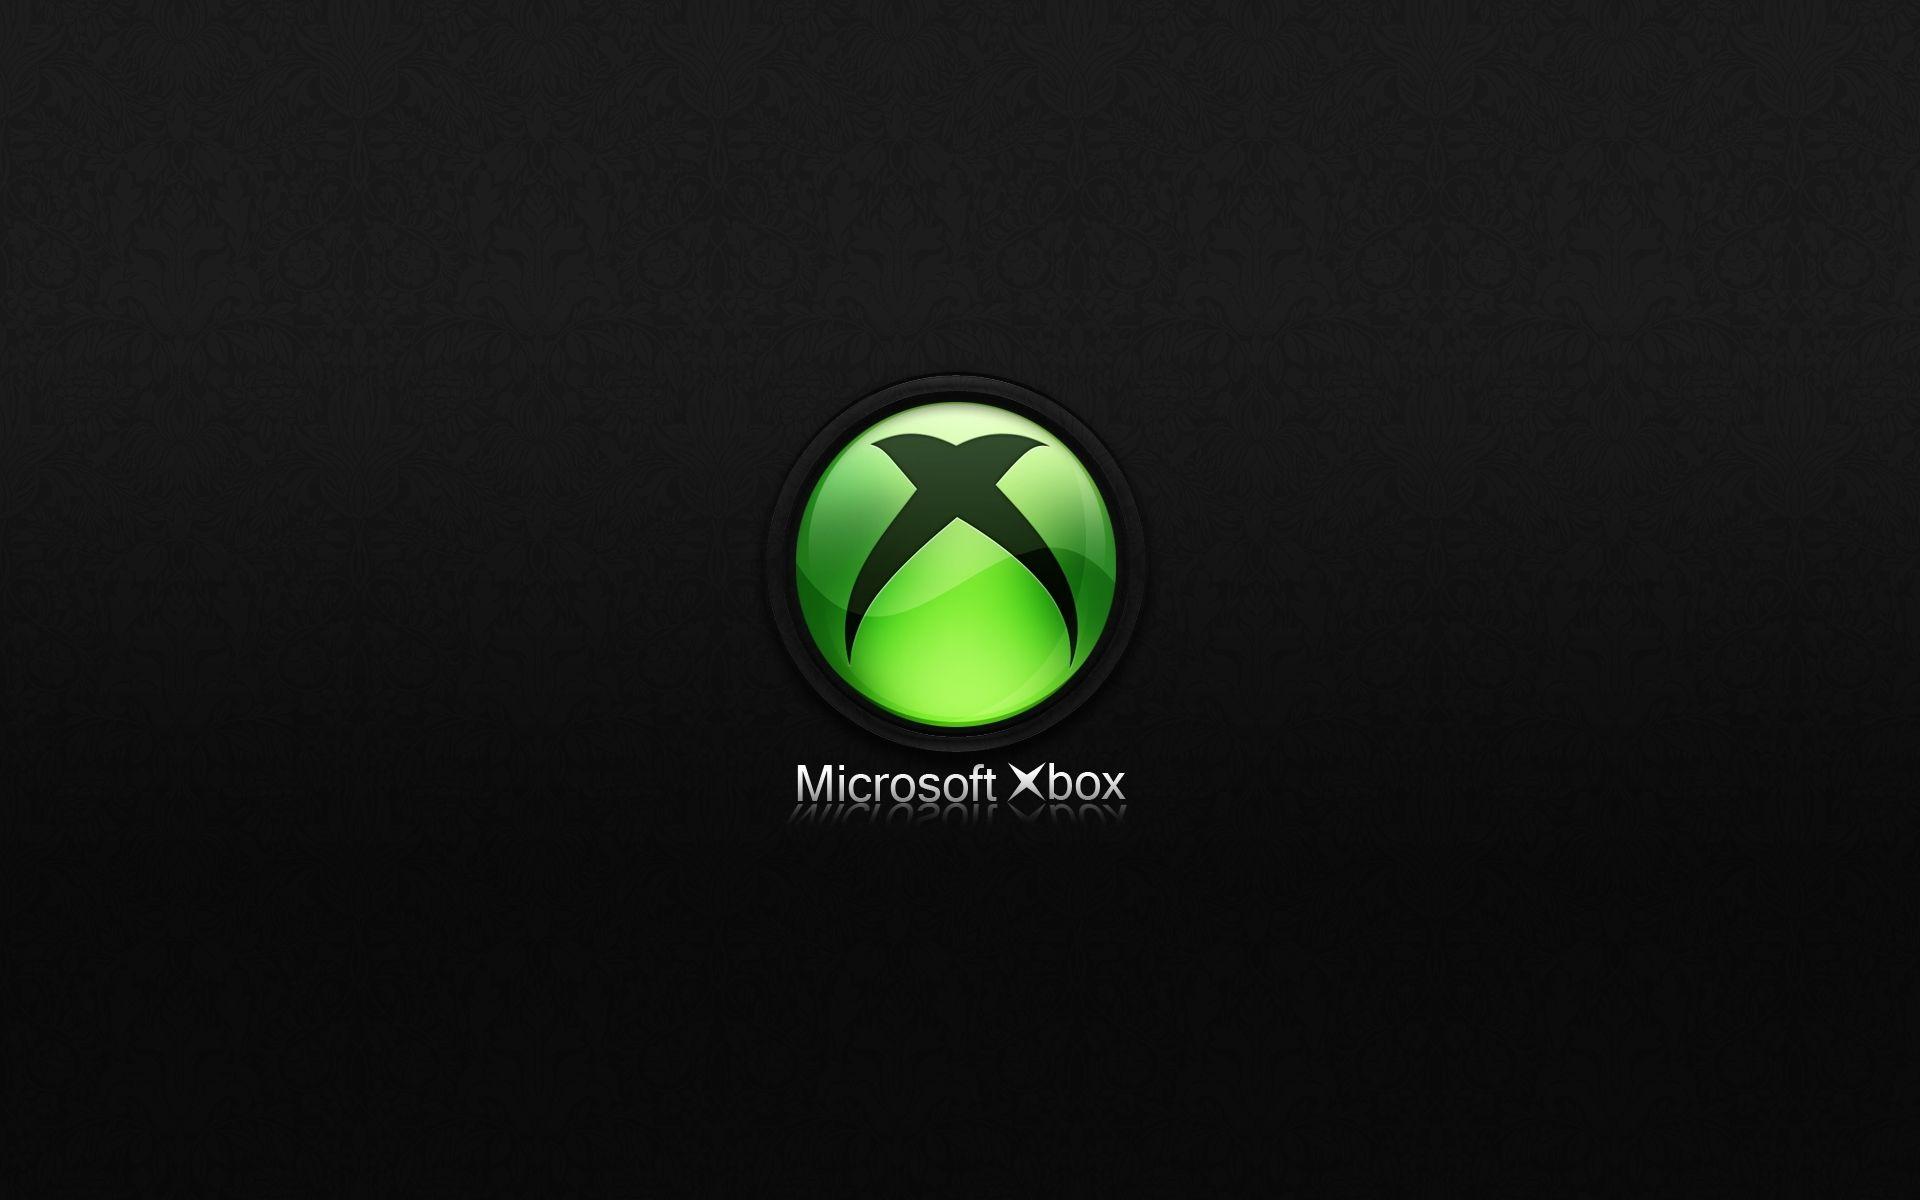 Xbox Microsoft Wallpapers Kingdom Microsoft Wallpaper Xbox Computer Wallpaper